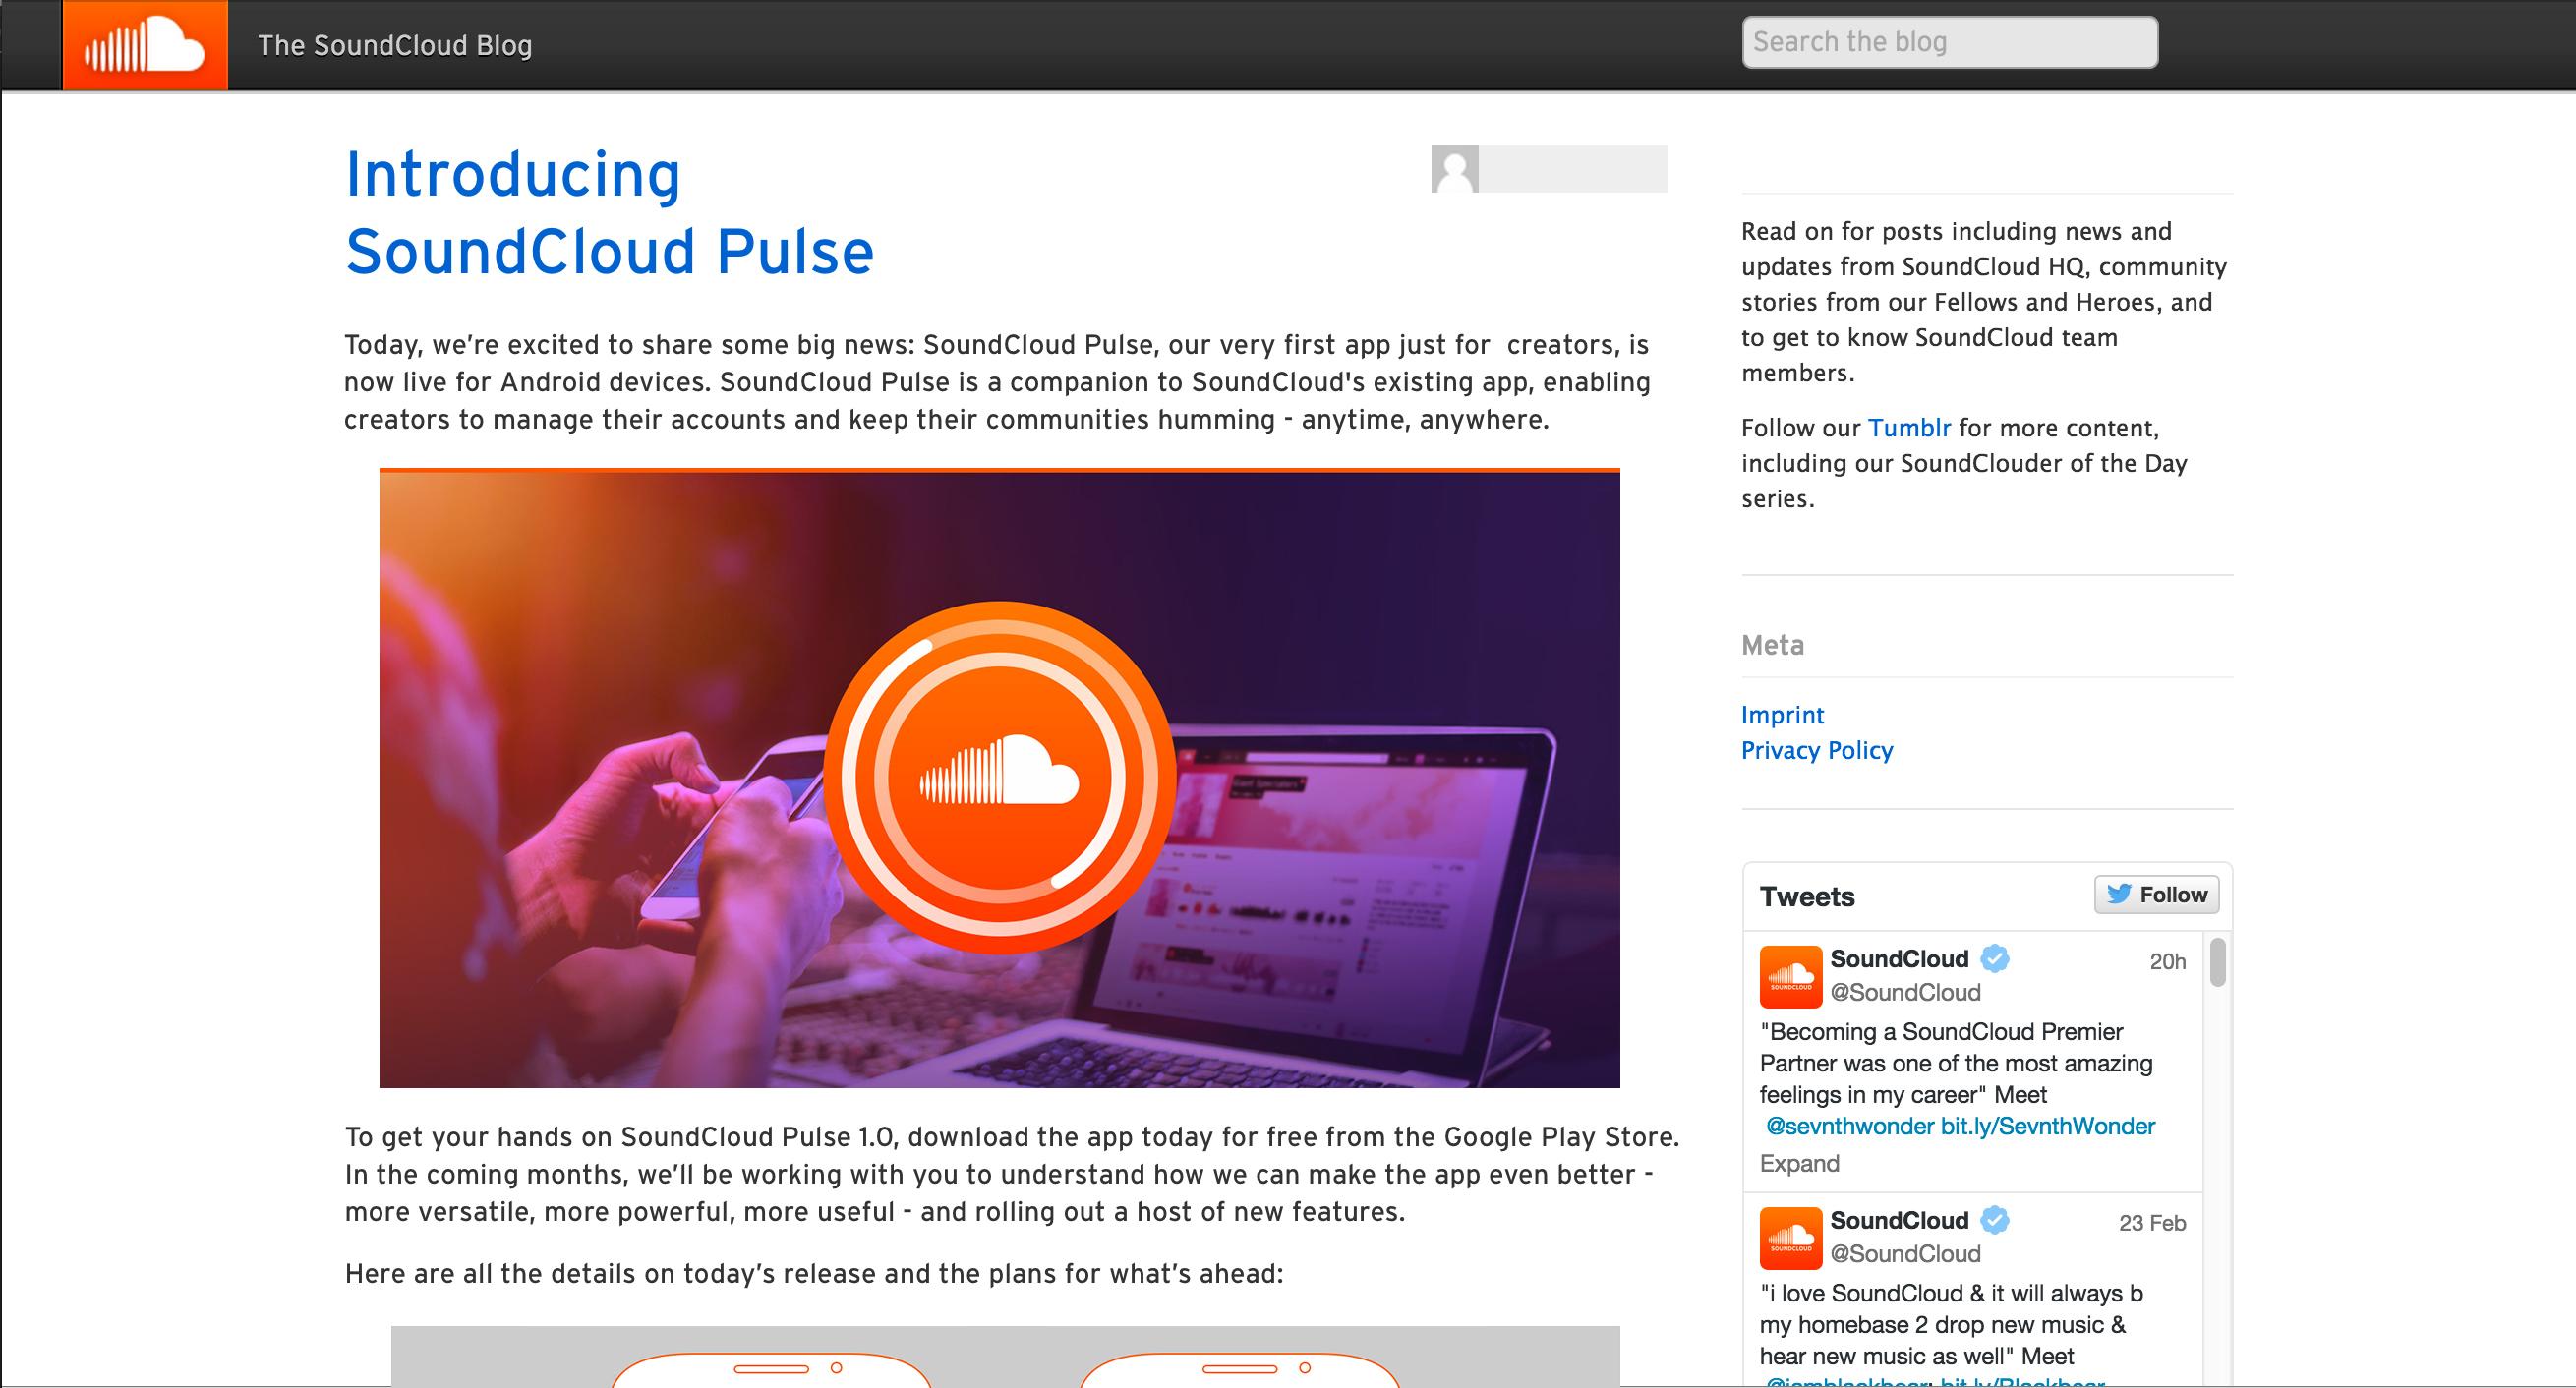 Image of the SoundCloud blog introducing SoundCloud Pulse